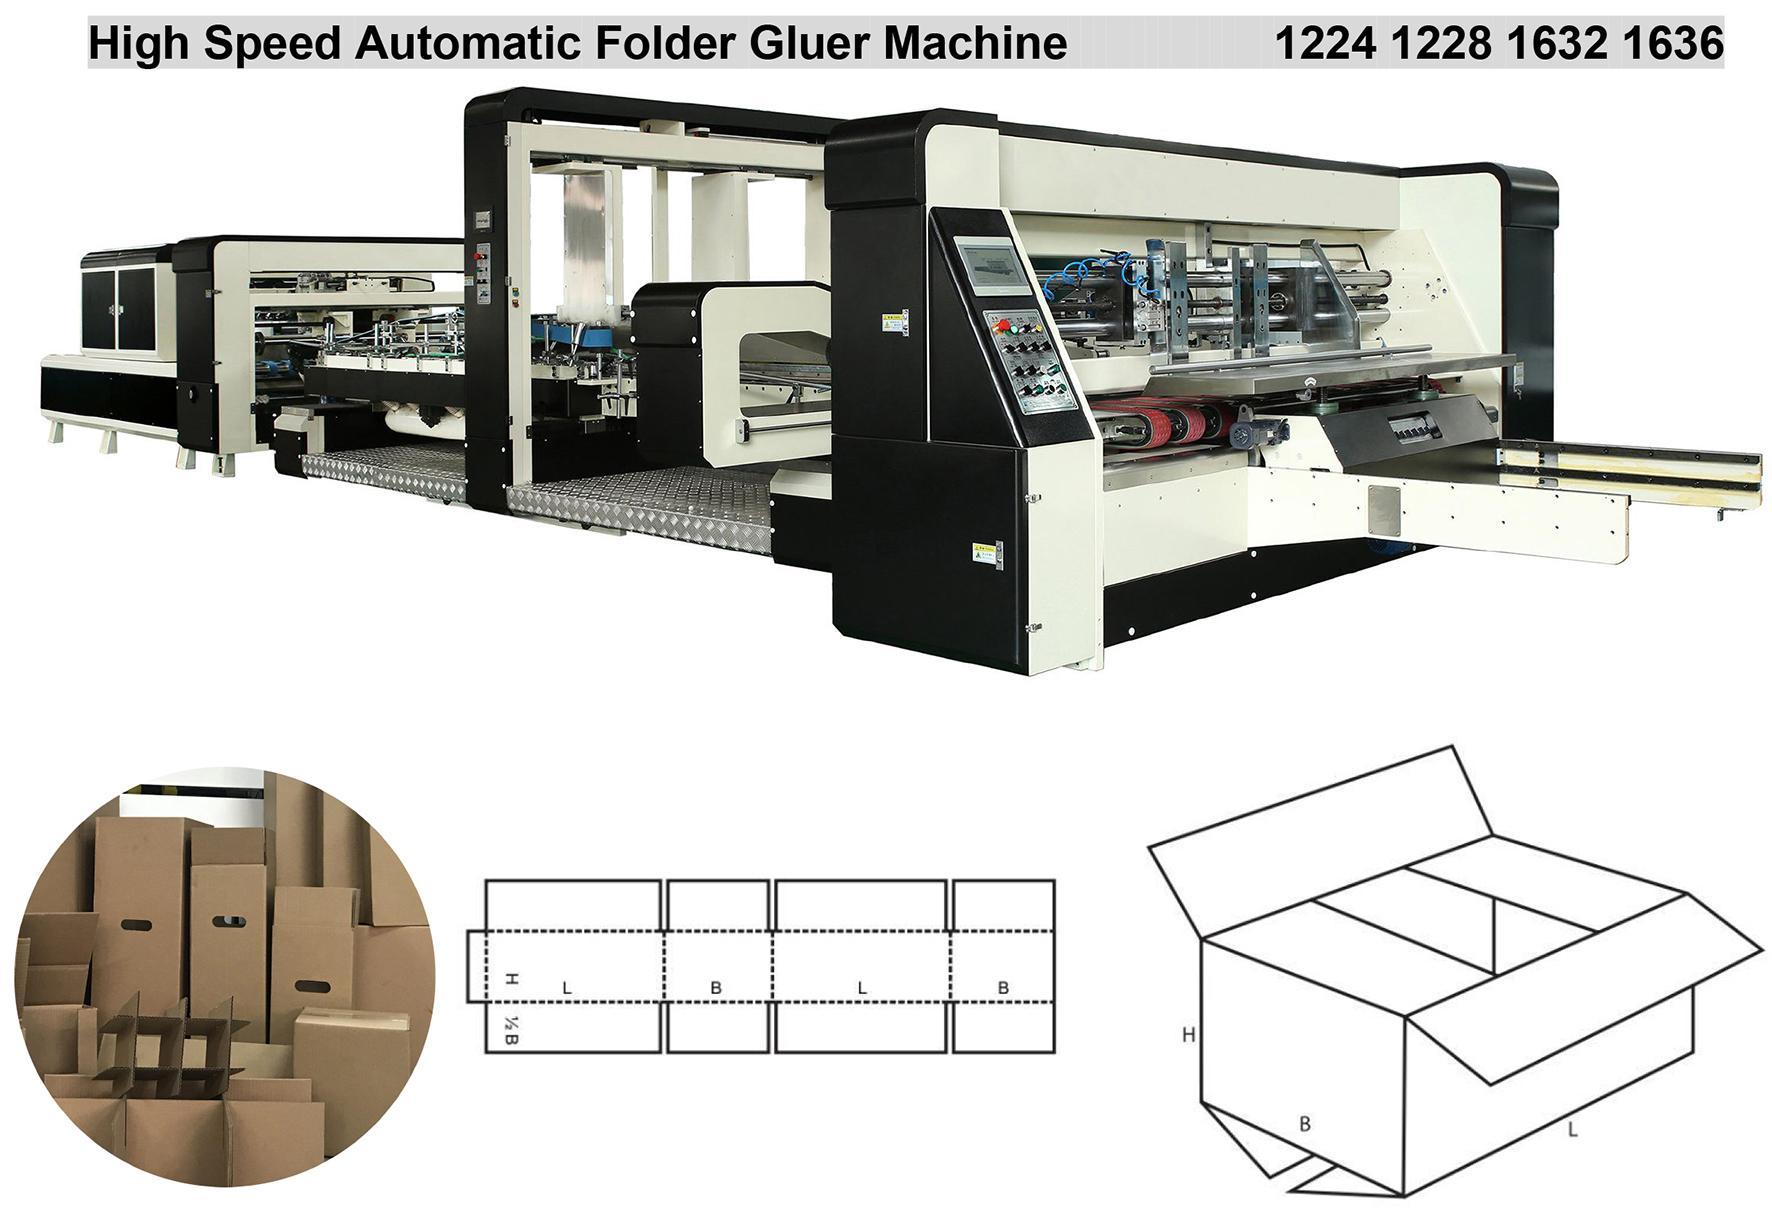 Corrugated carton box folding and gluing machine for carton box making 1224 2